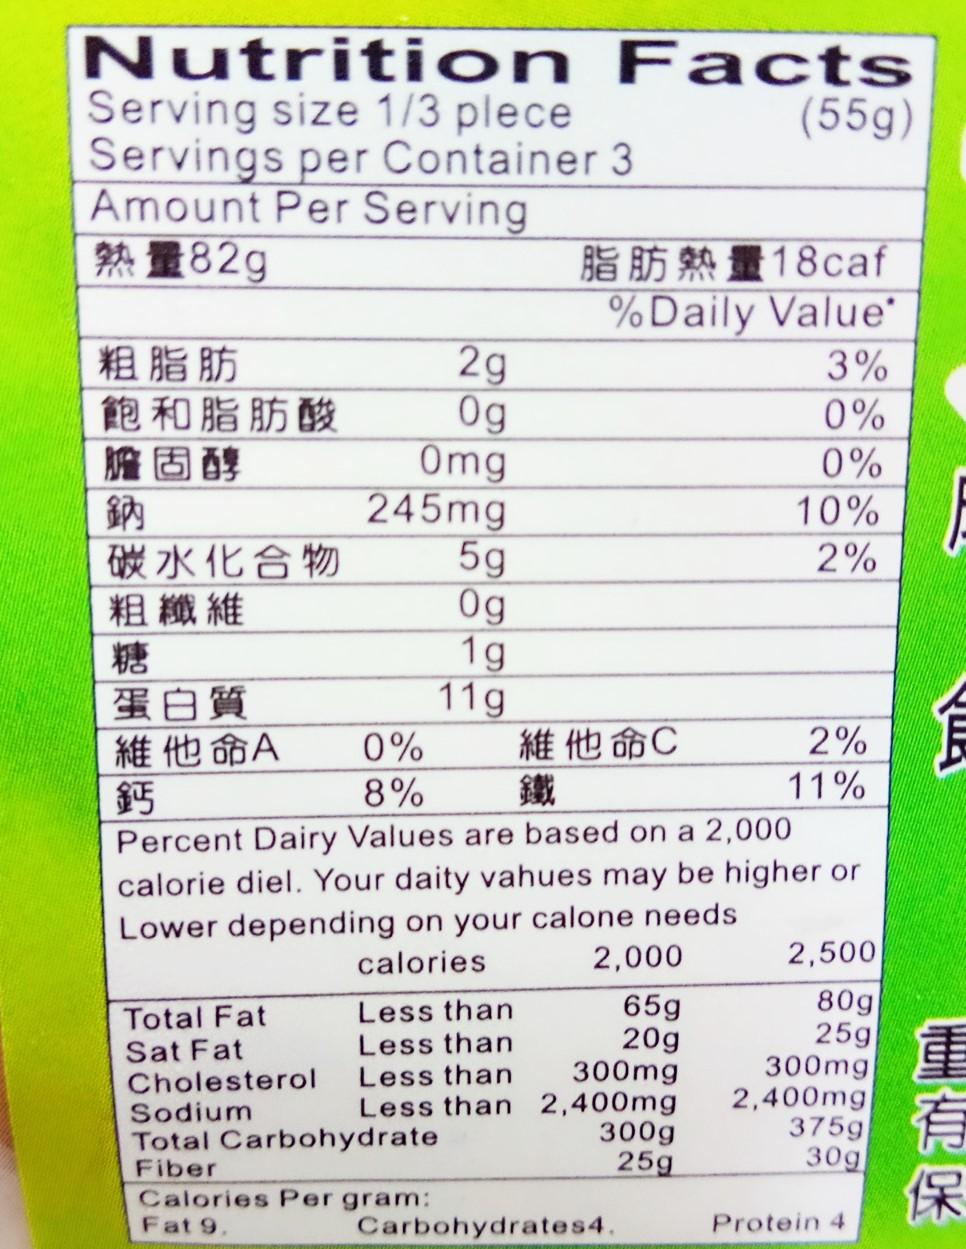 Image Vege Duck 佳味 - 太空鸭 300grams